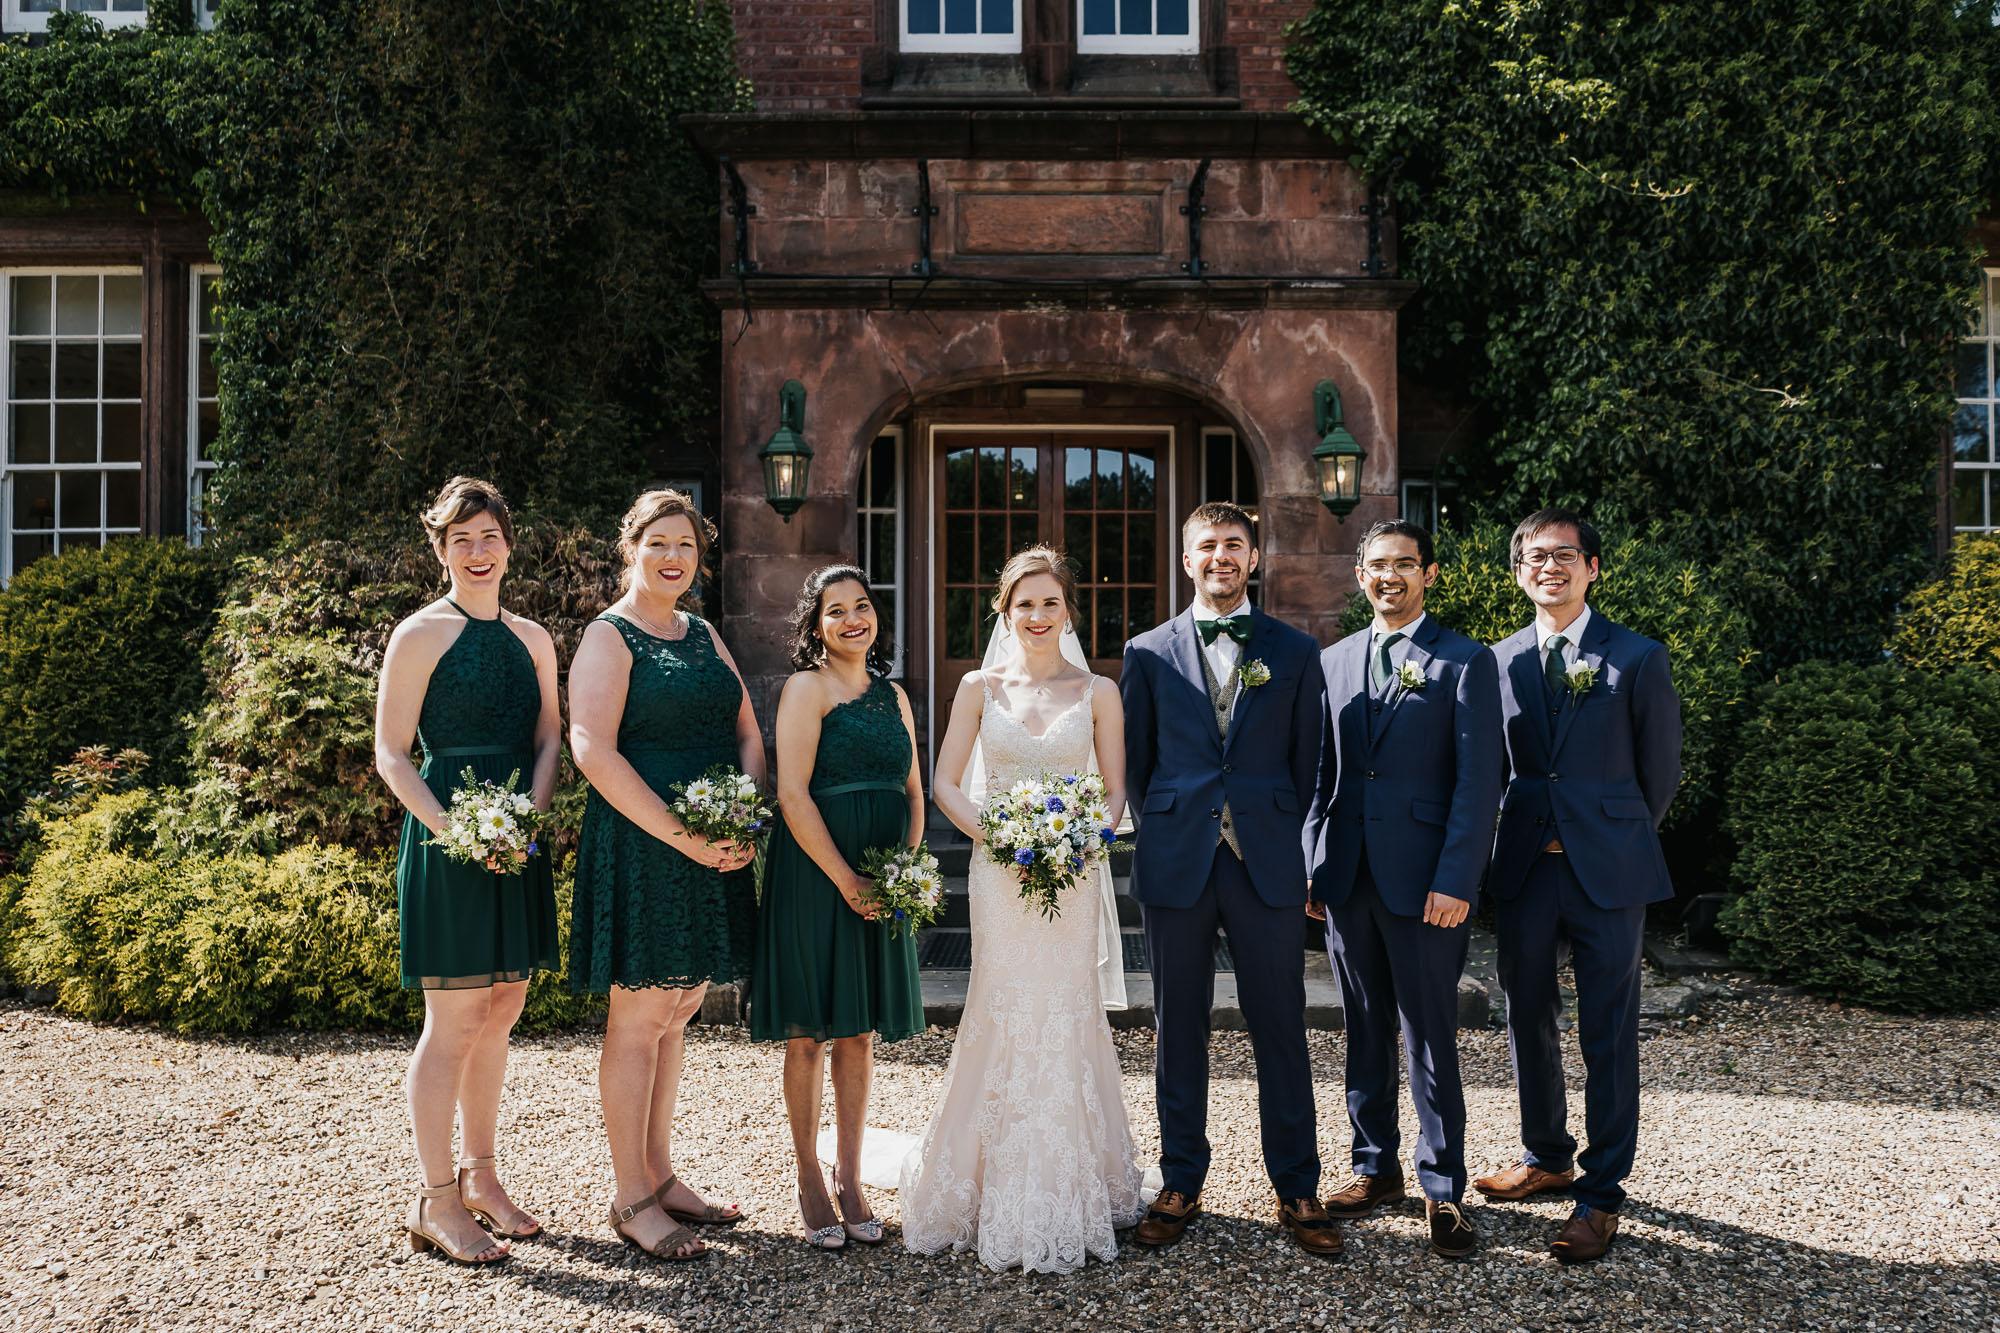 Nunsmere Hall Hotel Wedding photograhpy in cheshire wedding photographer (25 of 42).jpg